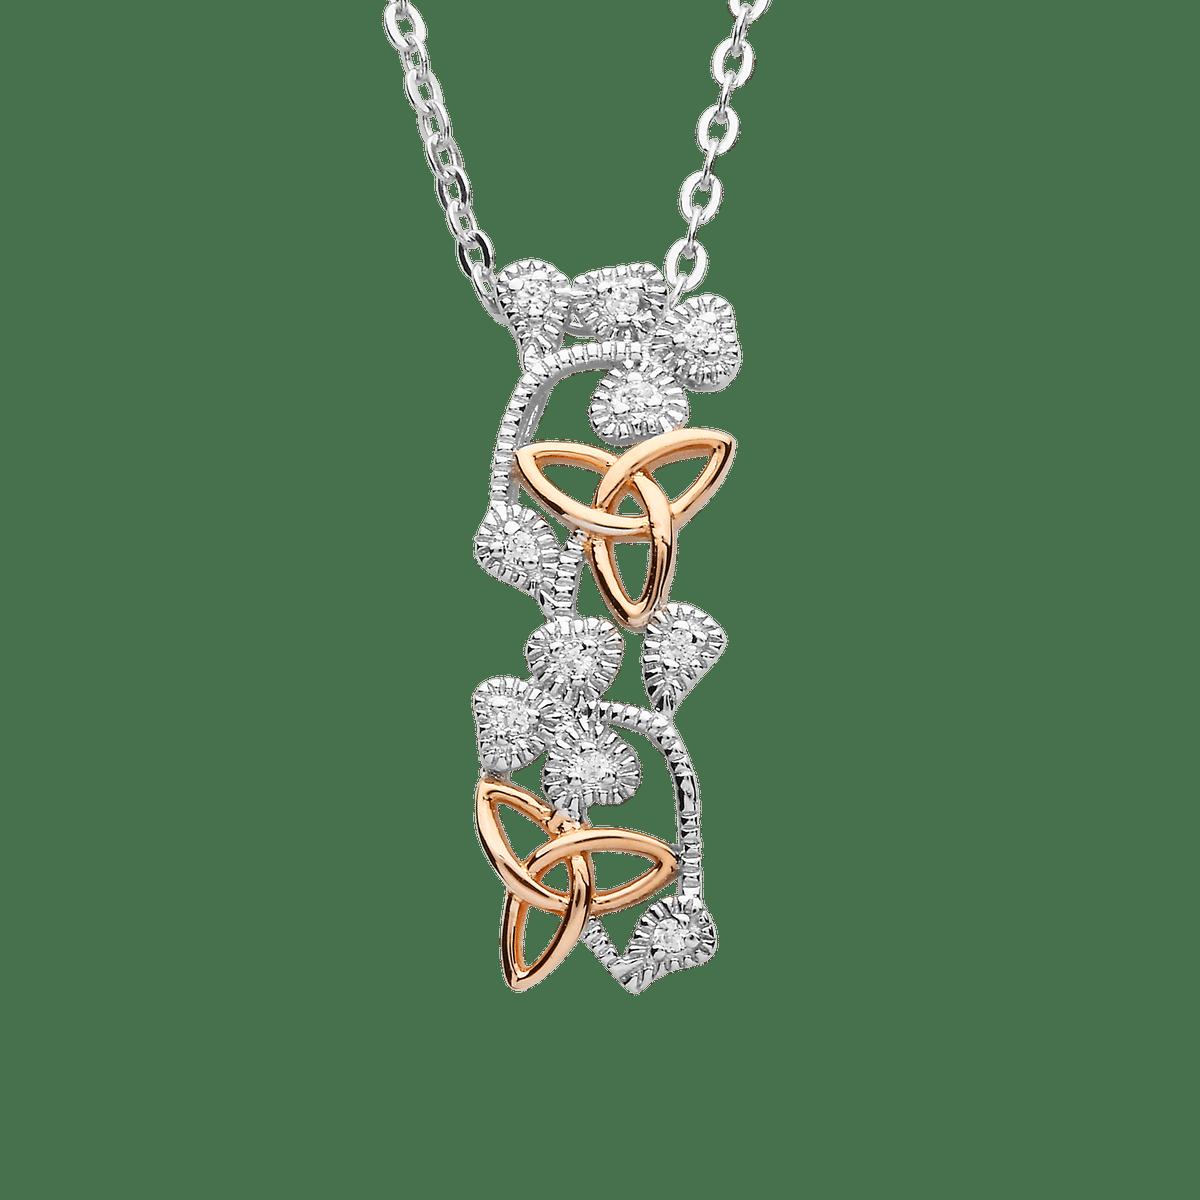 "S/silver Cz Shamrock Rose Gold Plated Trinity Knots Hugy Pendant 18"" Chain"